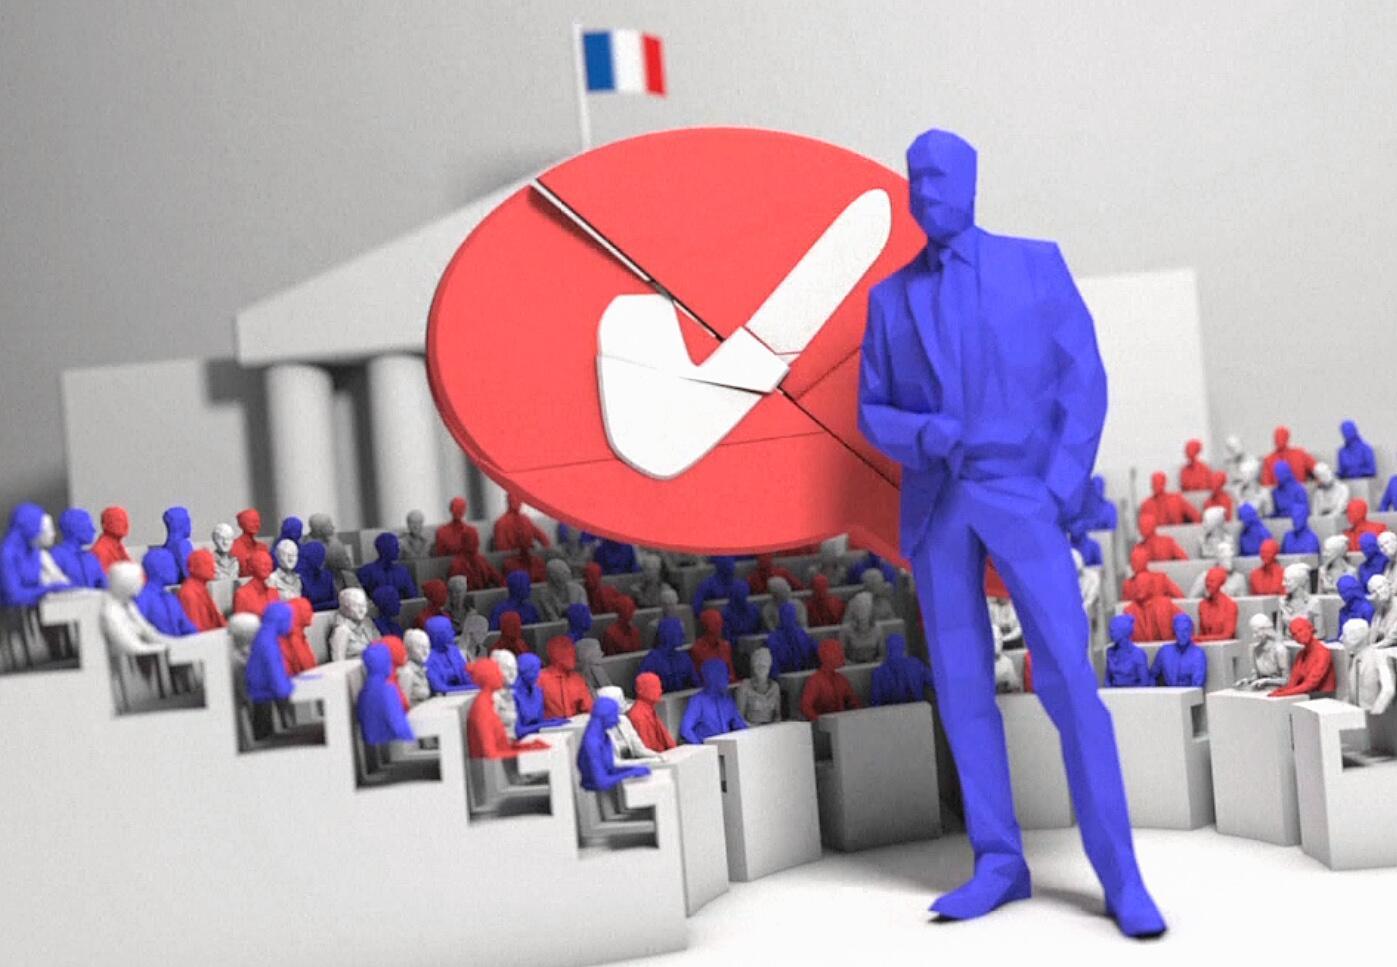 Bild zu Vidoografik: Frankreichs Präsidialsystem